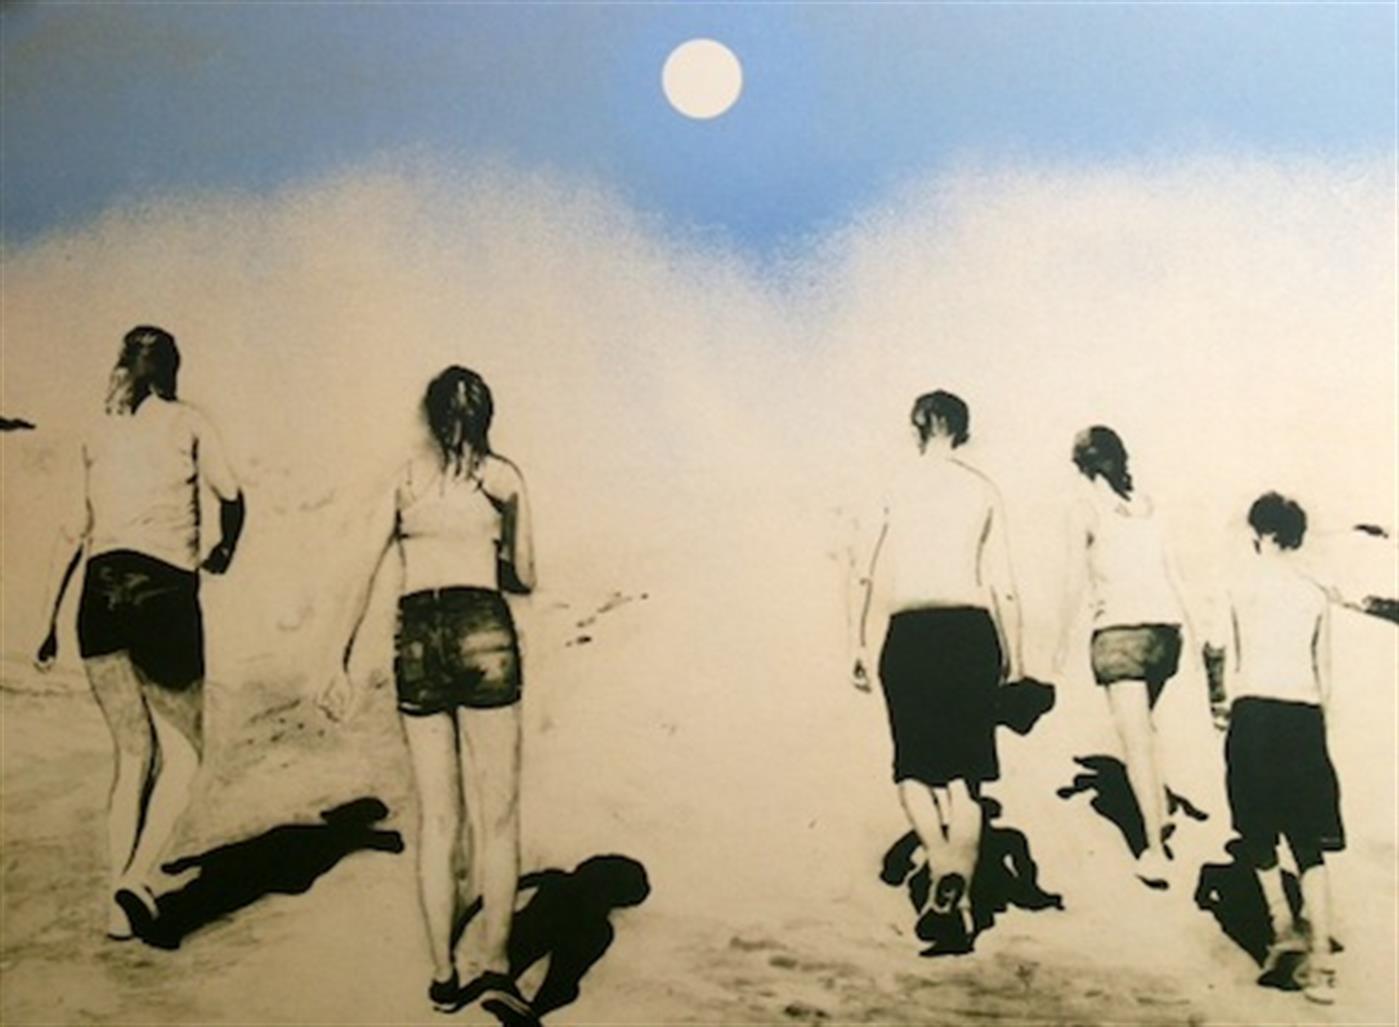 Joakim Allgulander - Moonwalkers, colour lithograph